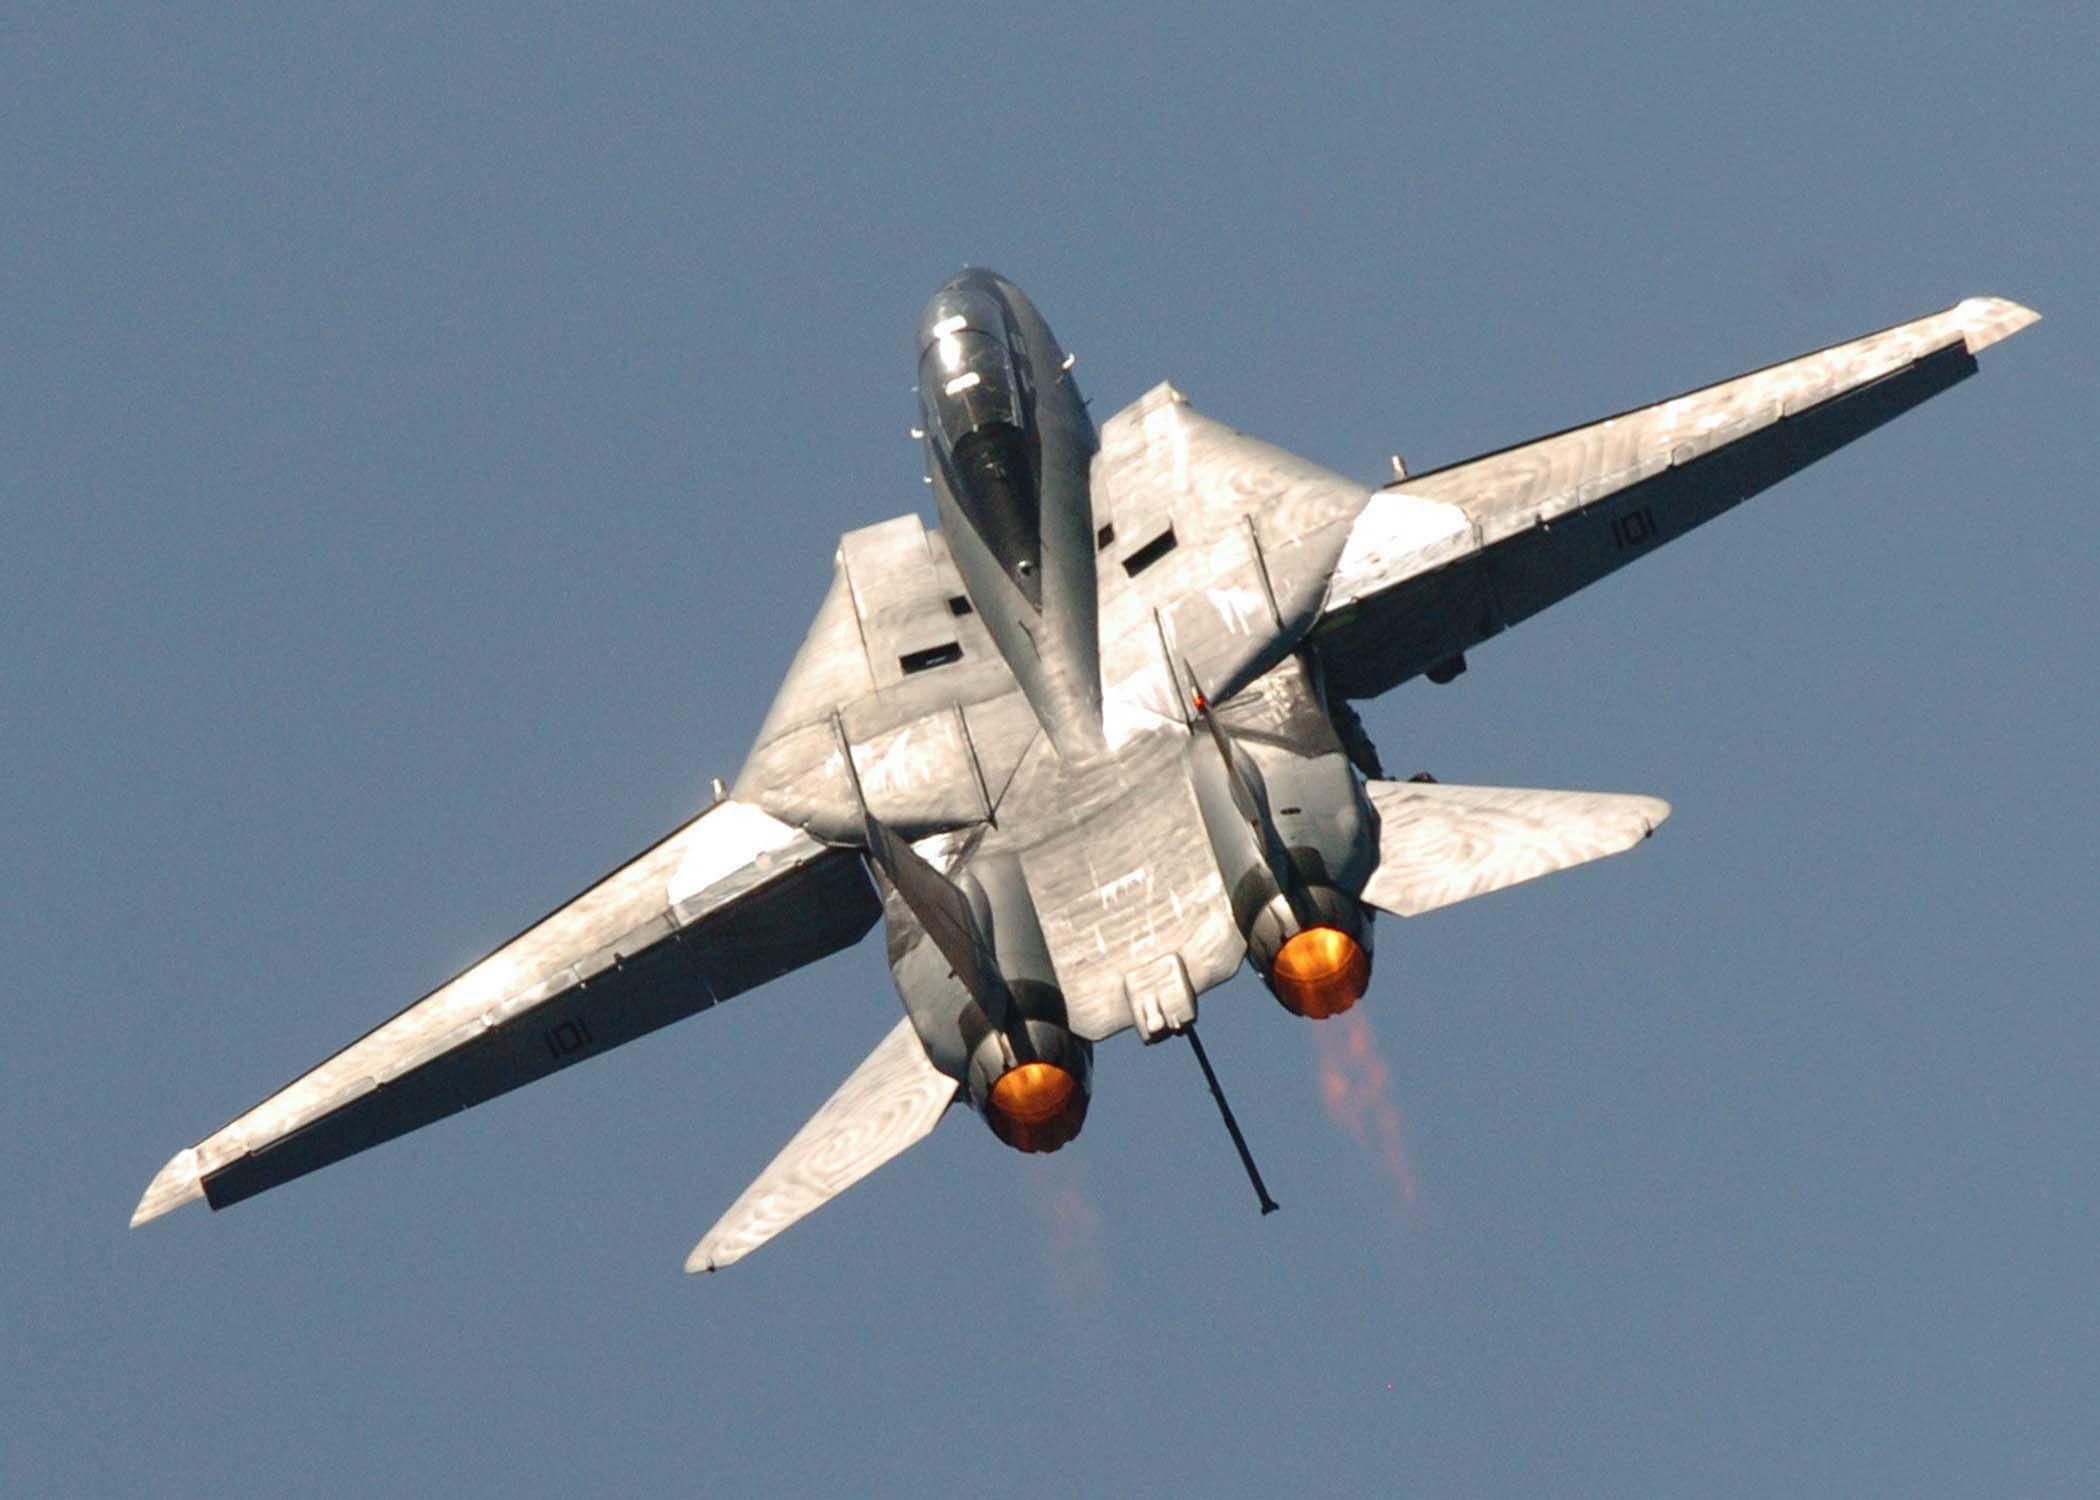 14 tomcat jet fighter - photo #31